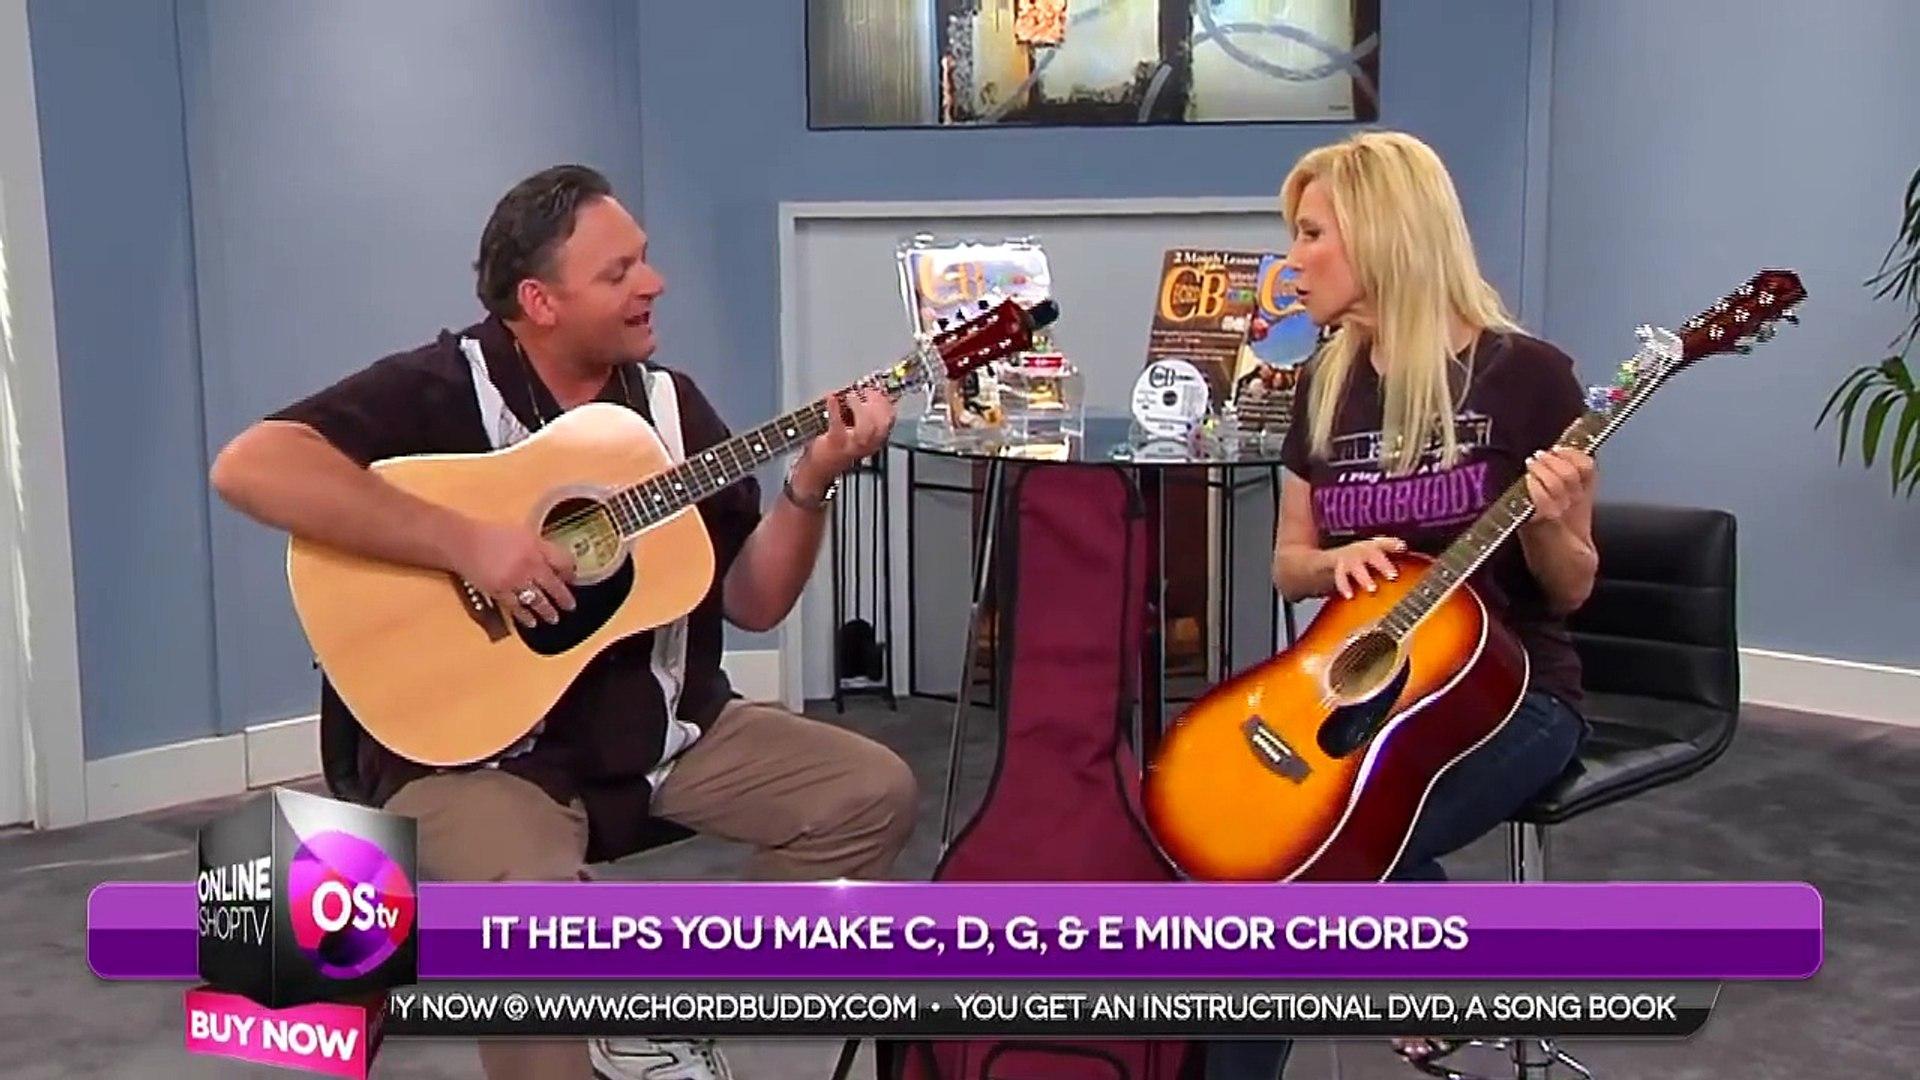 Chord Buddy: Learn How to Play Guitar [OStv]